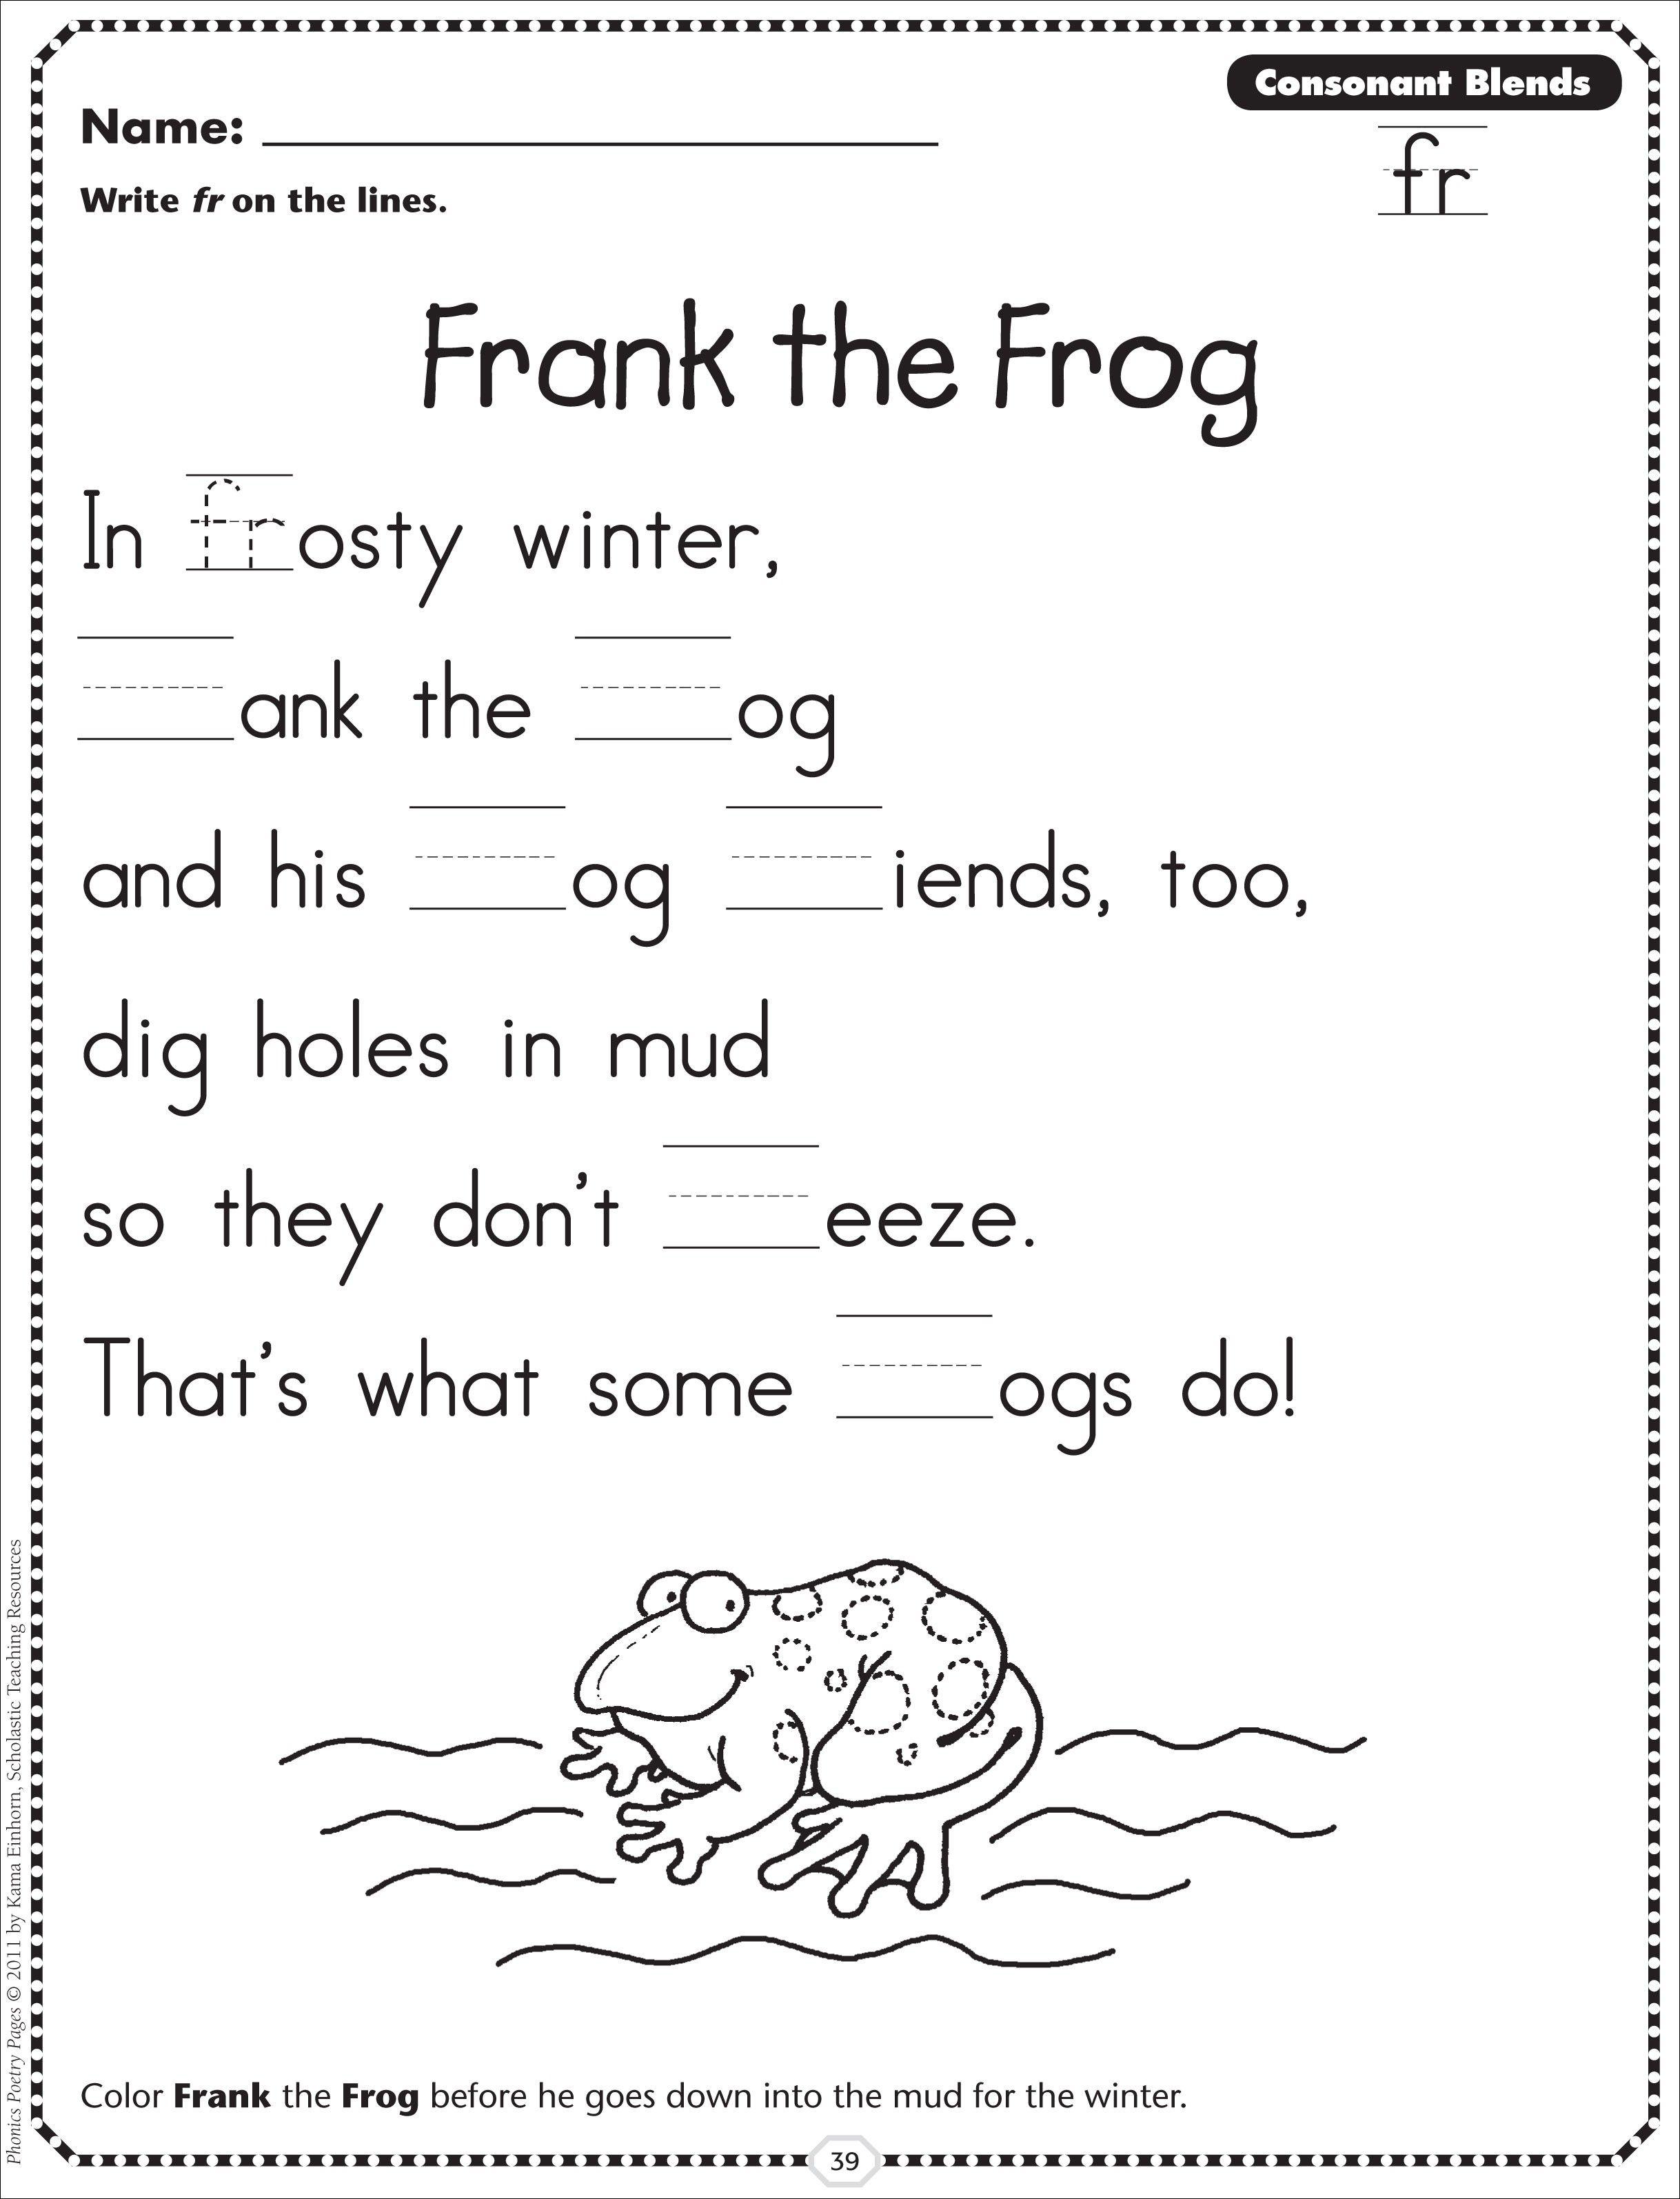 Pin By Kiara Mitchell On Teaching Blends Worksheets Consonant Blends Worksheets Kindergarten Phonics Worksheets [ 3189 x 2437 Pixel ]